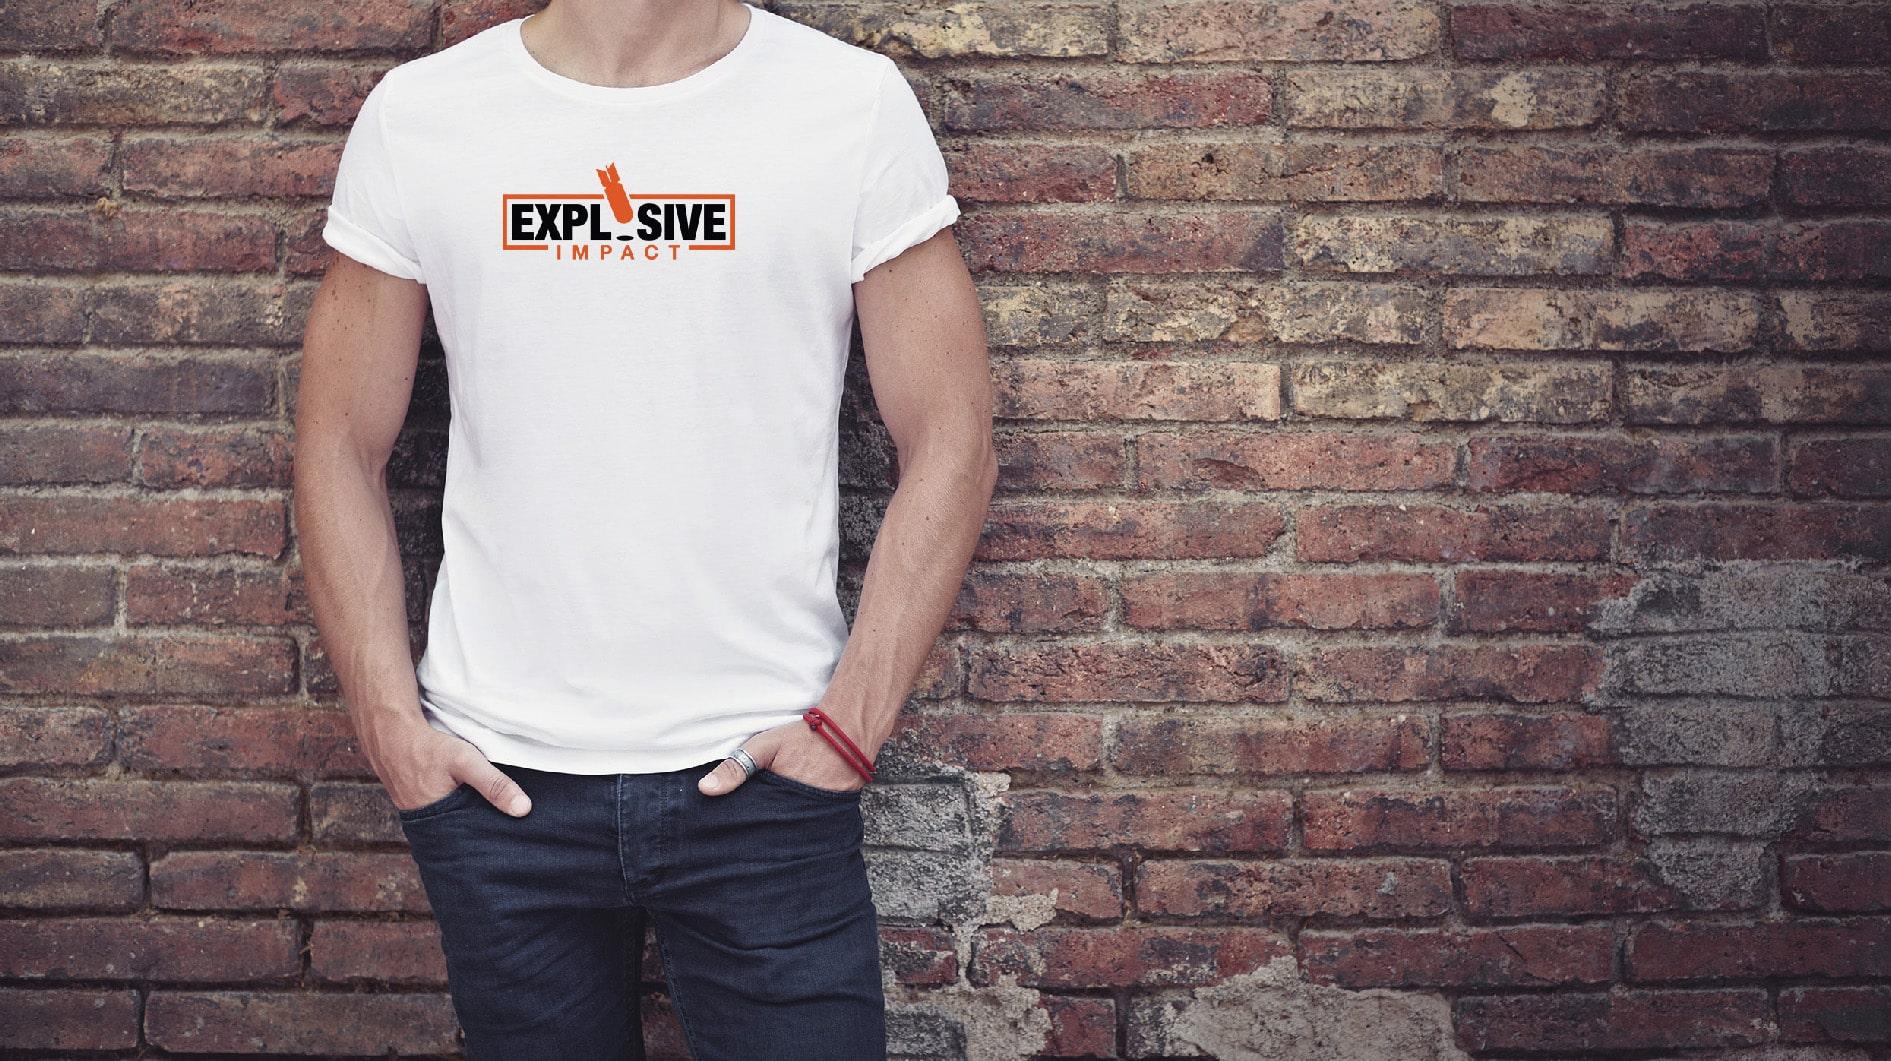 Explosive Impact T-Shirt